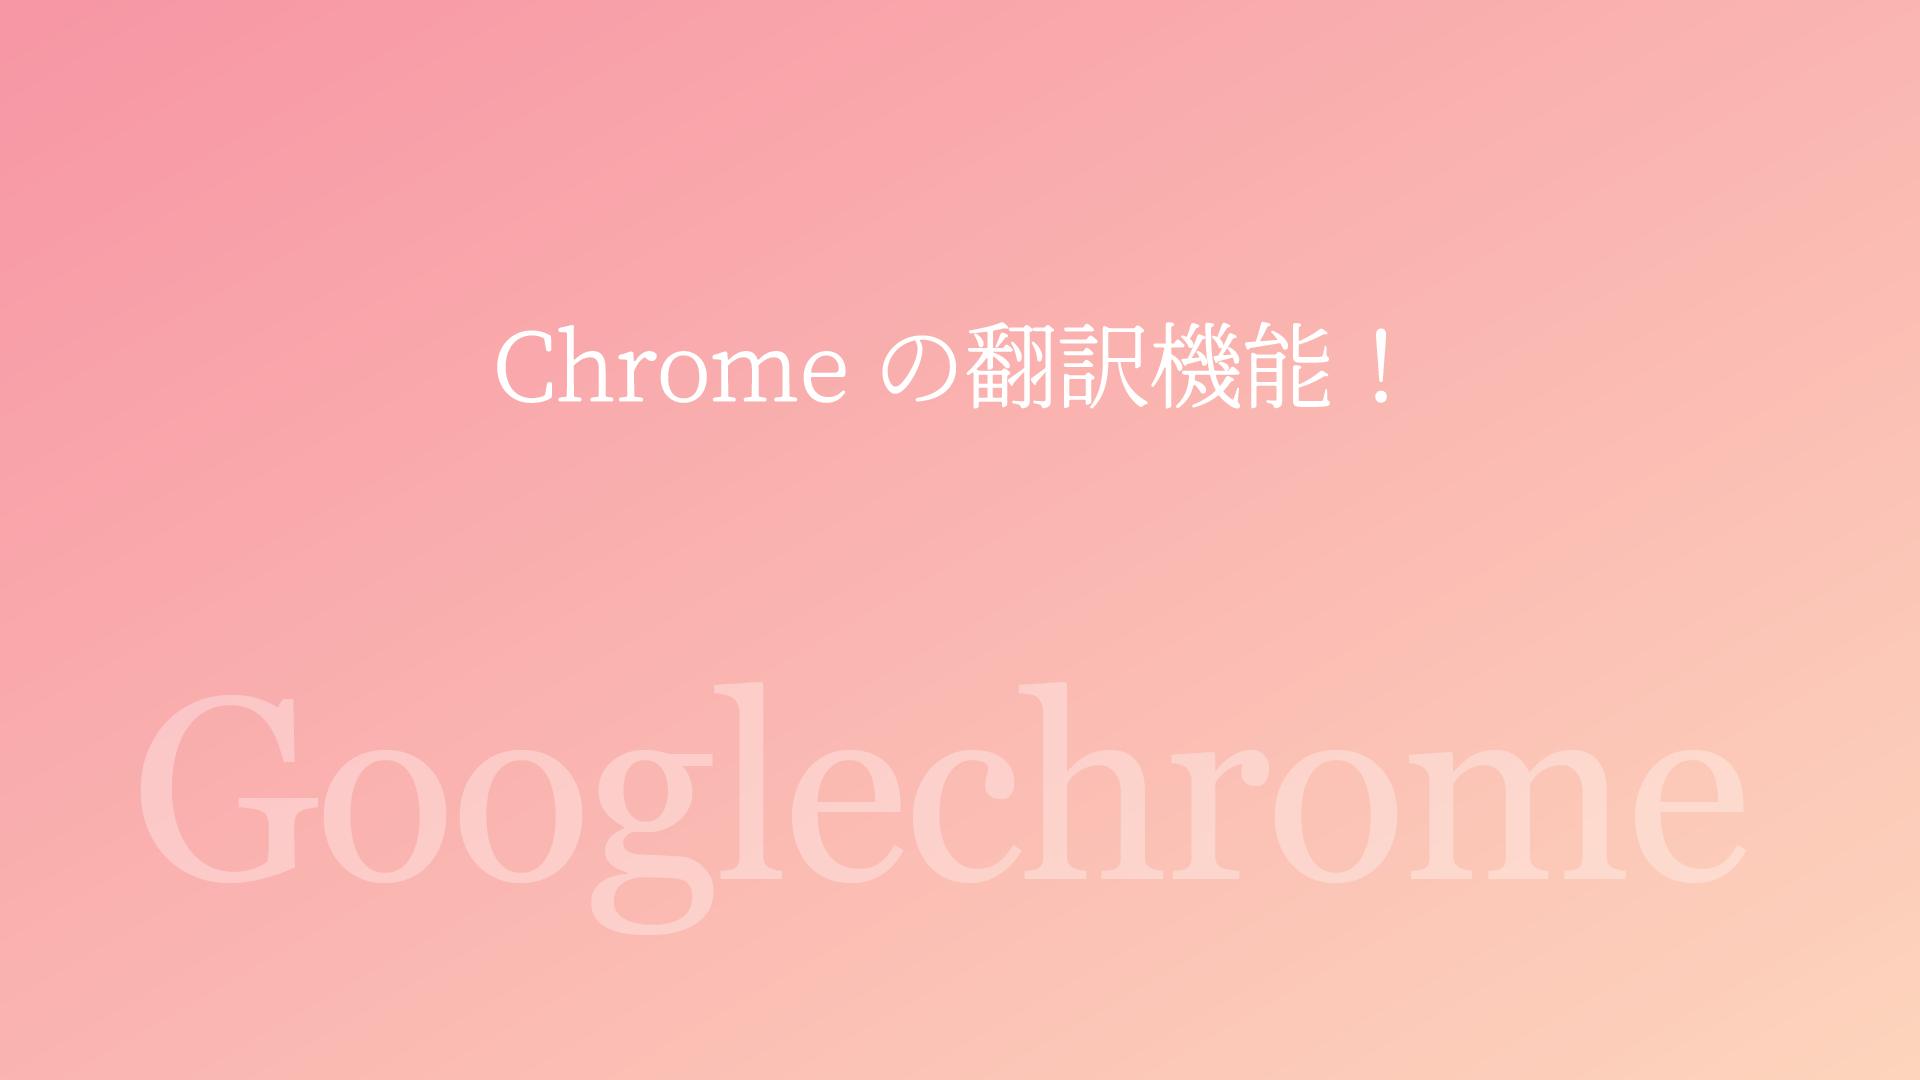 chromeの翻訳機能!膨張機能の追加で英語プラグインも簡単に!翻訳アプリとおまけ